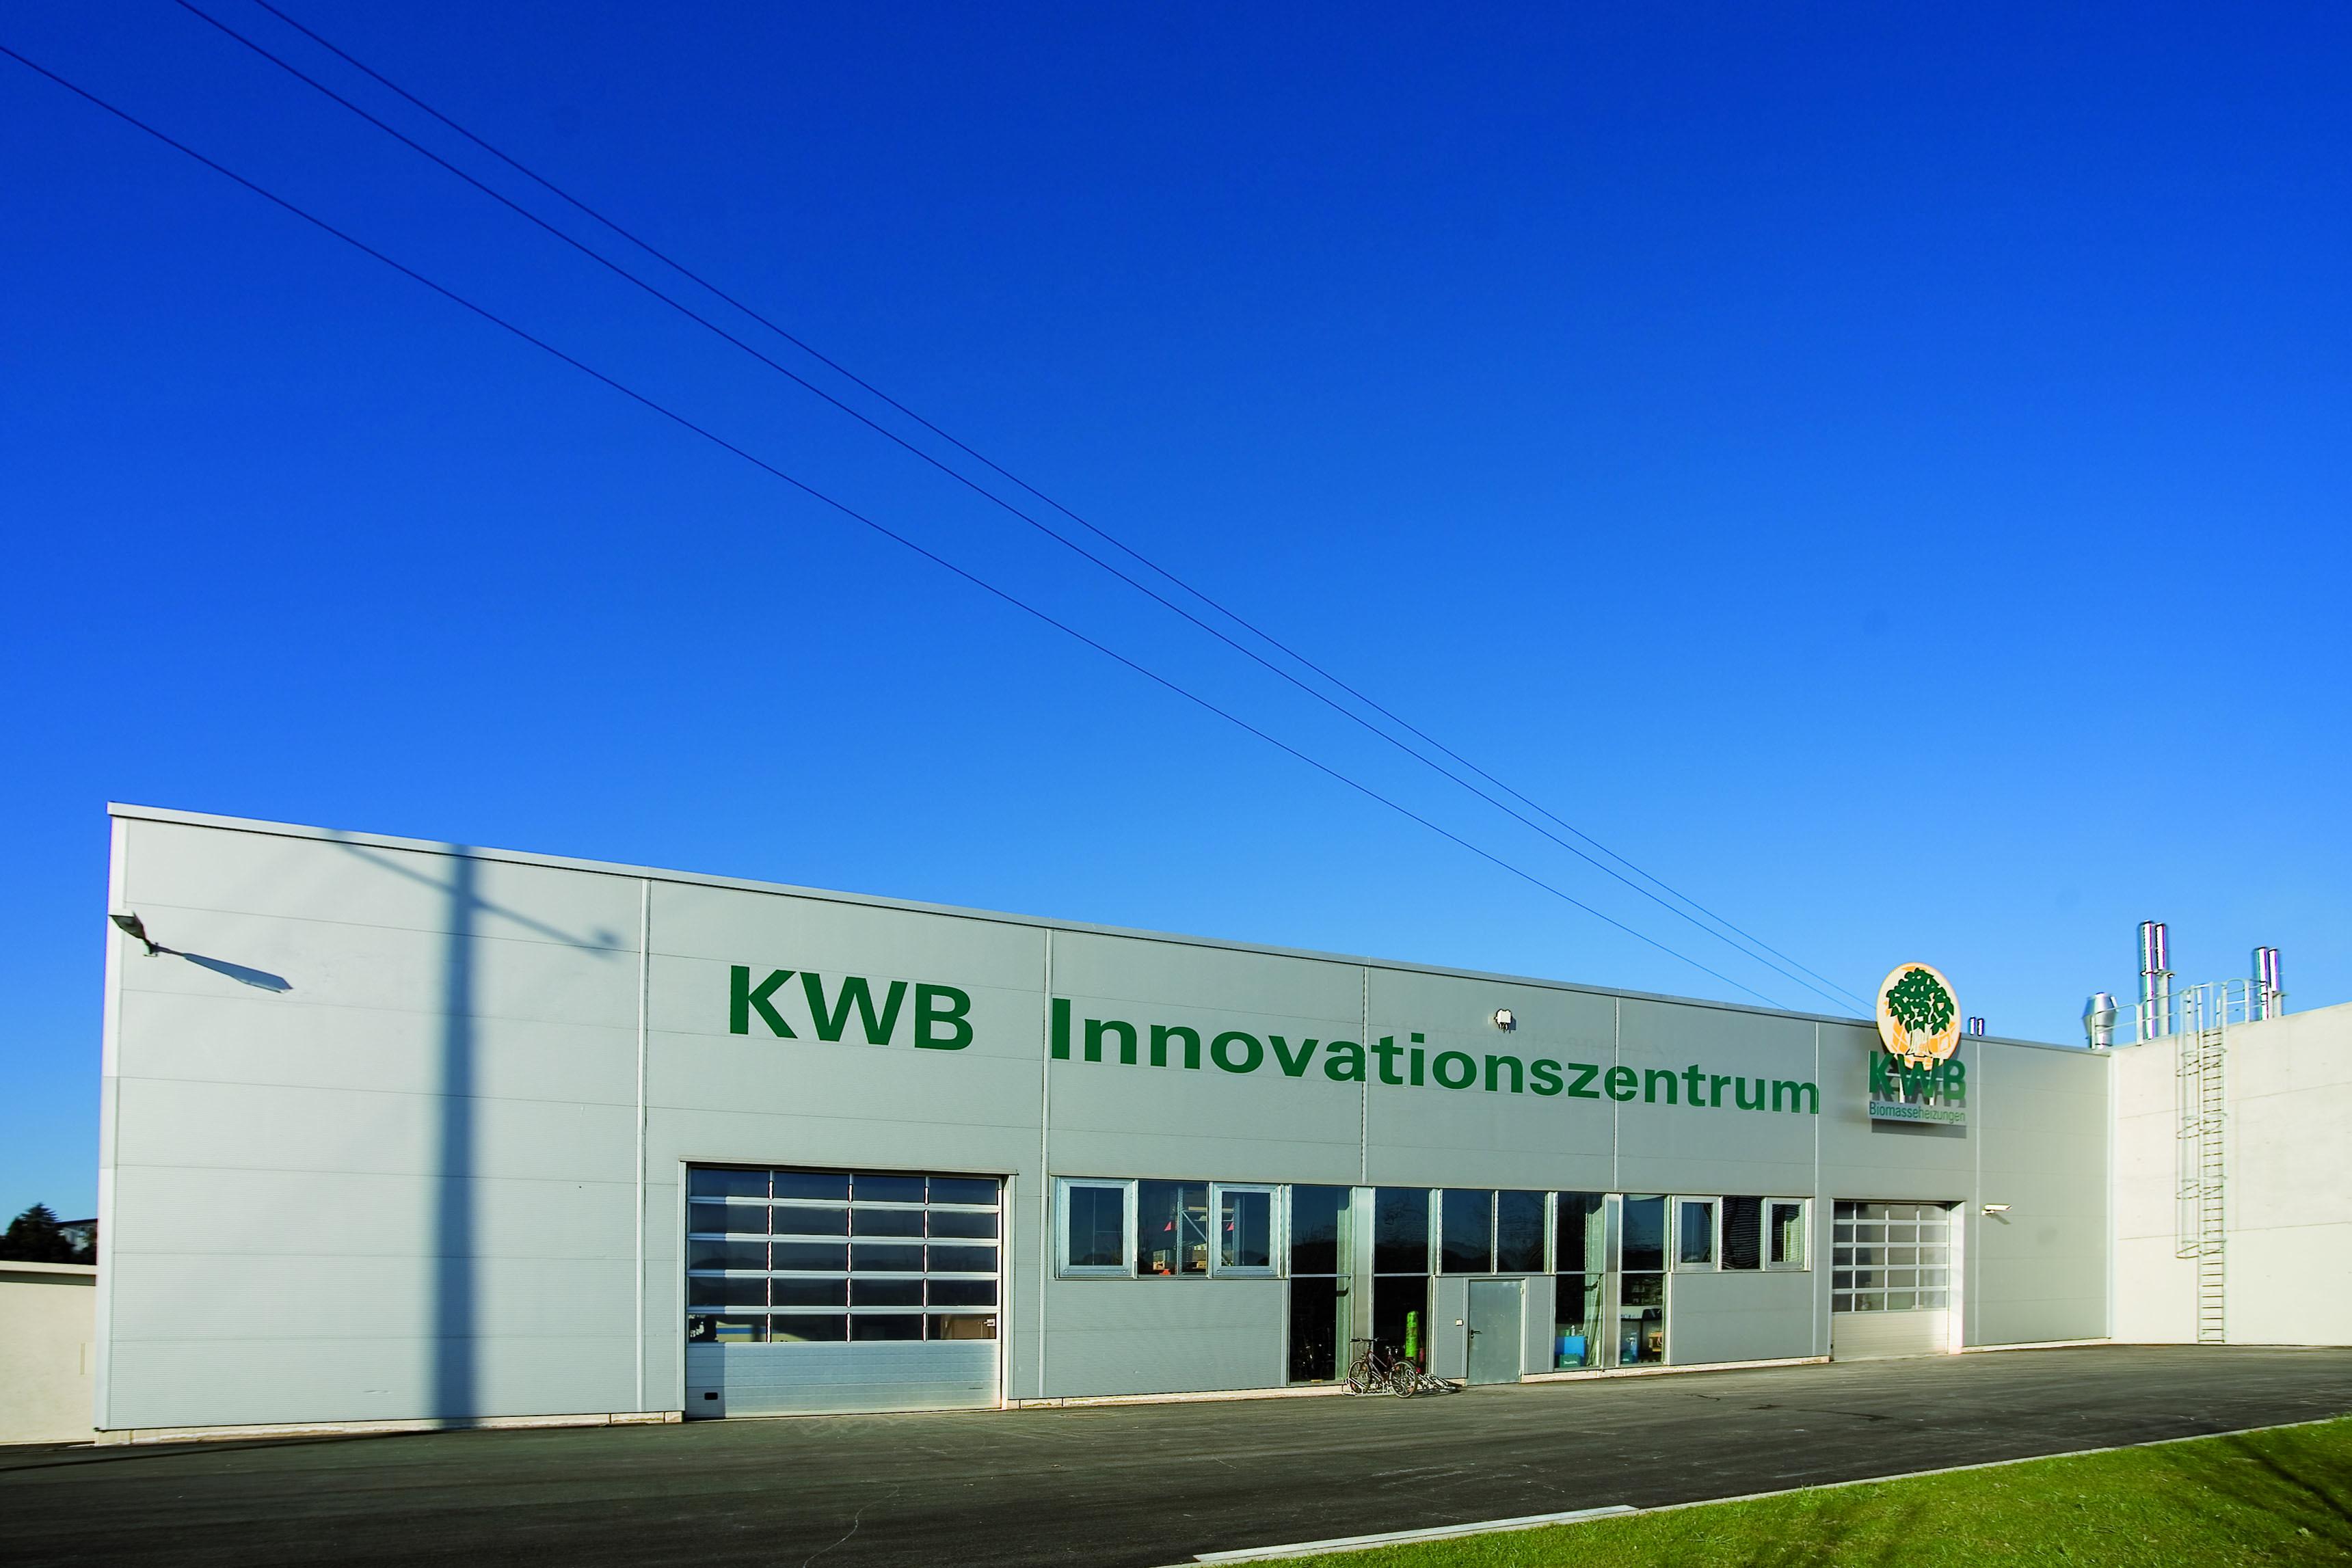 KWB Innovationszentrum